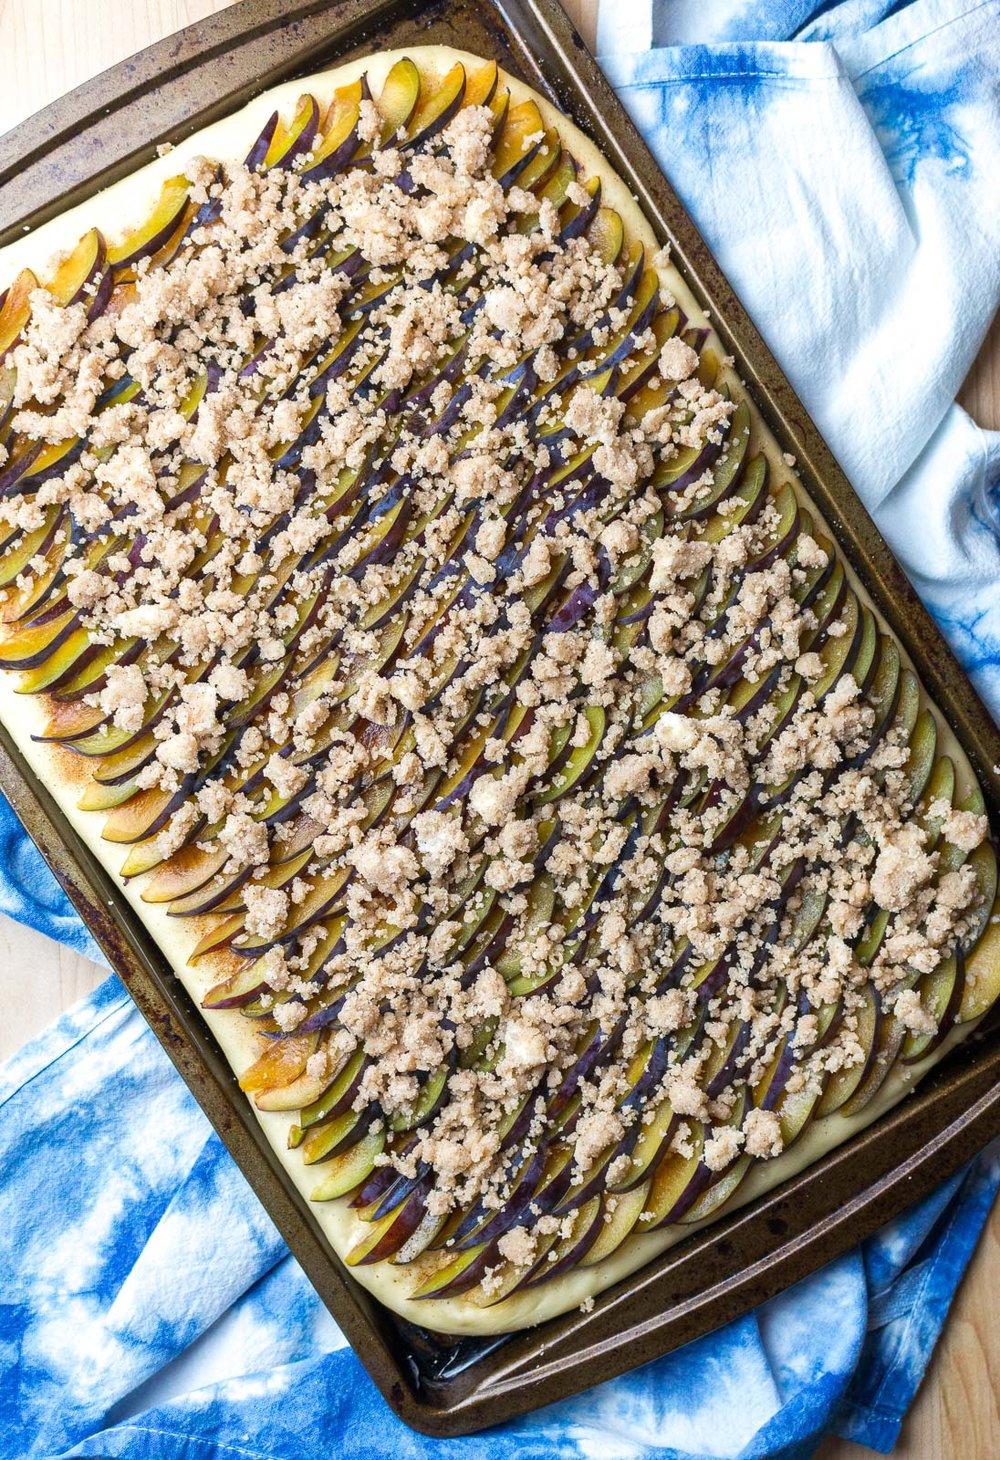 plaufmenkuchen-7.jpg